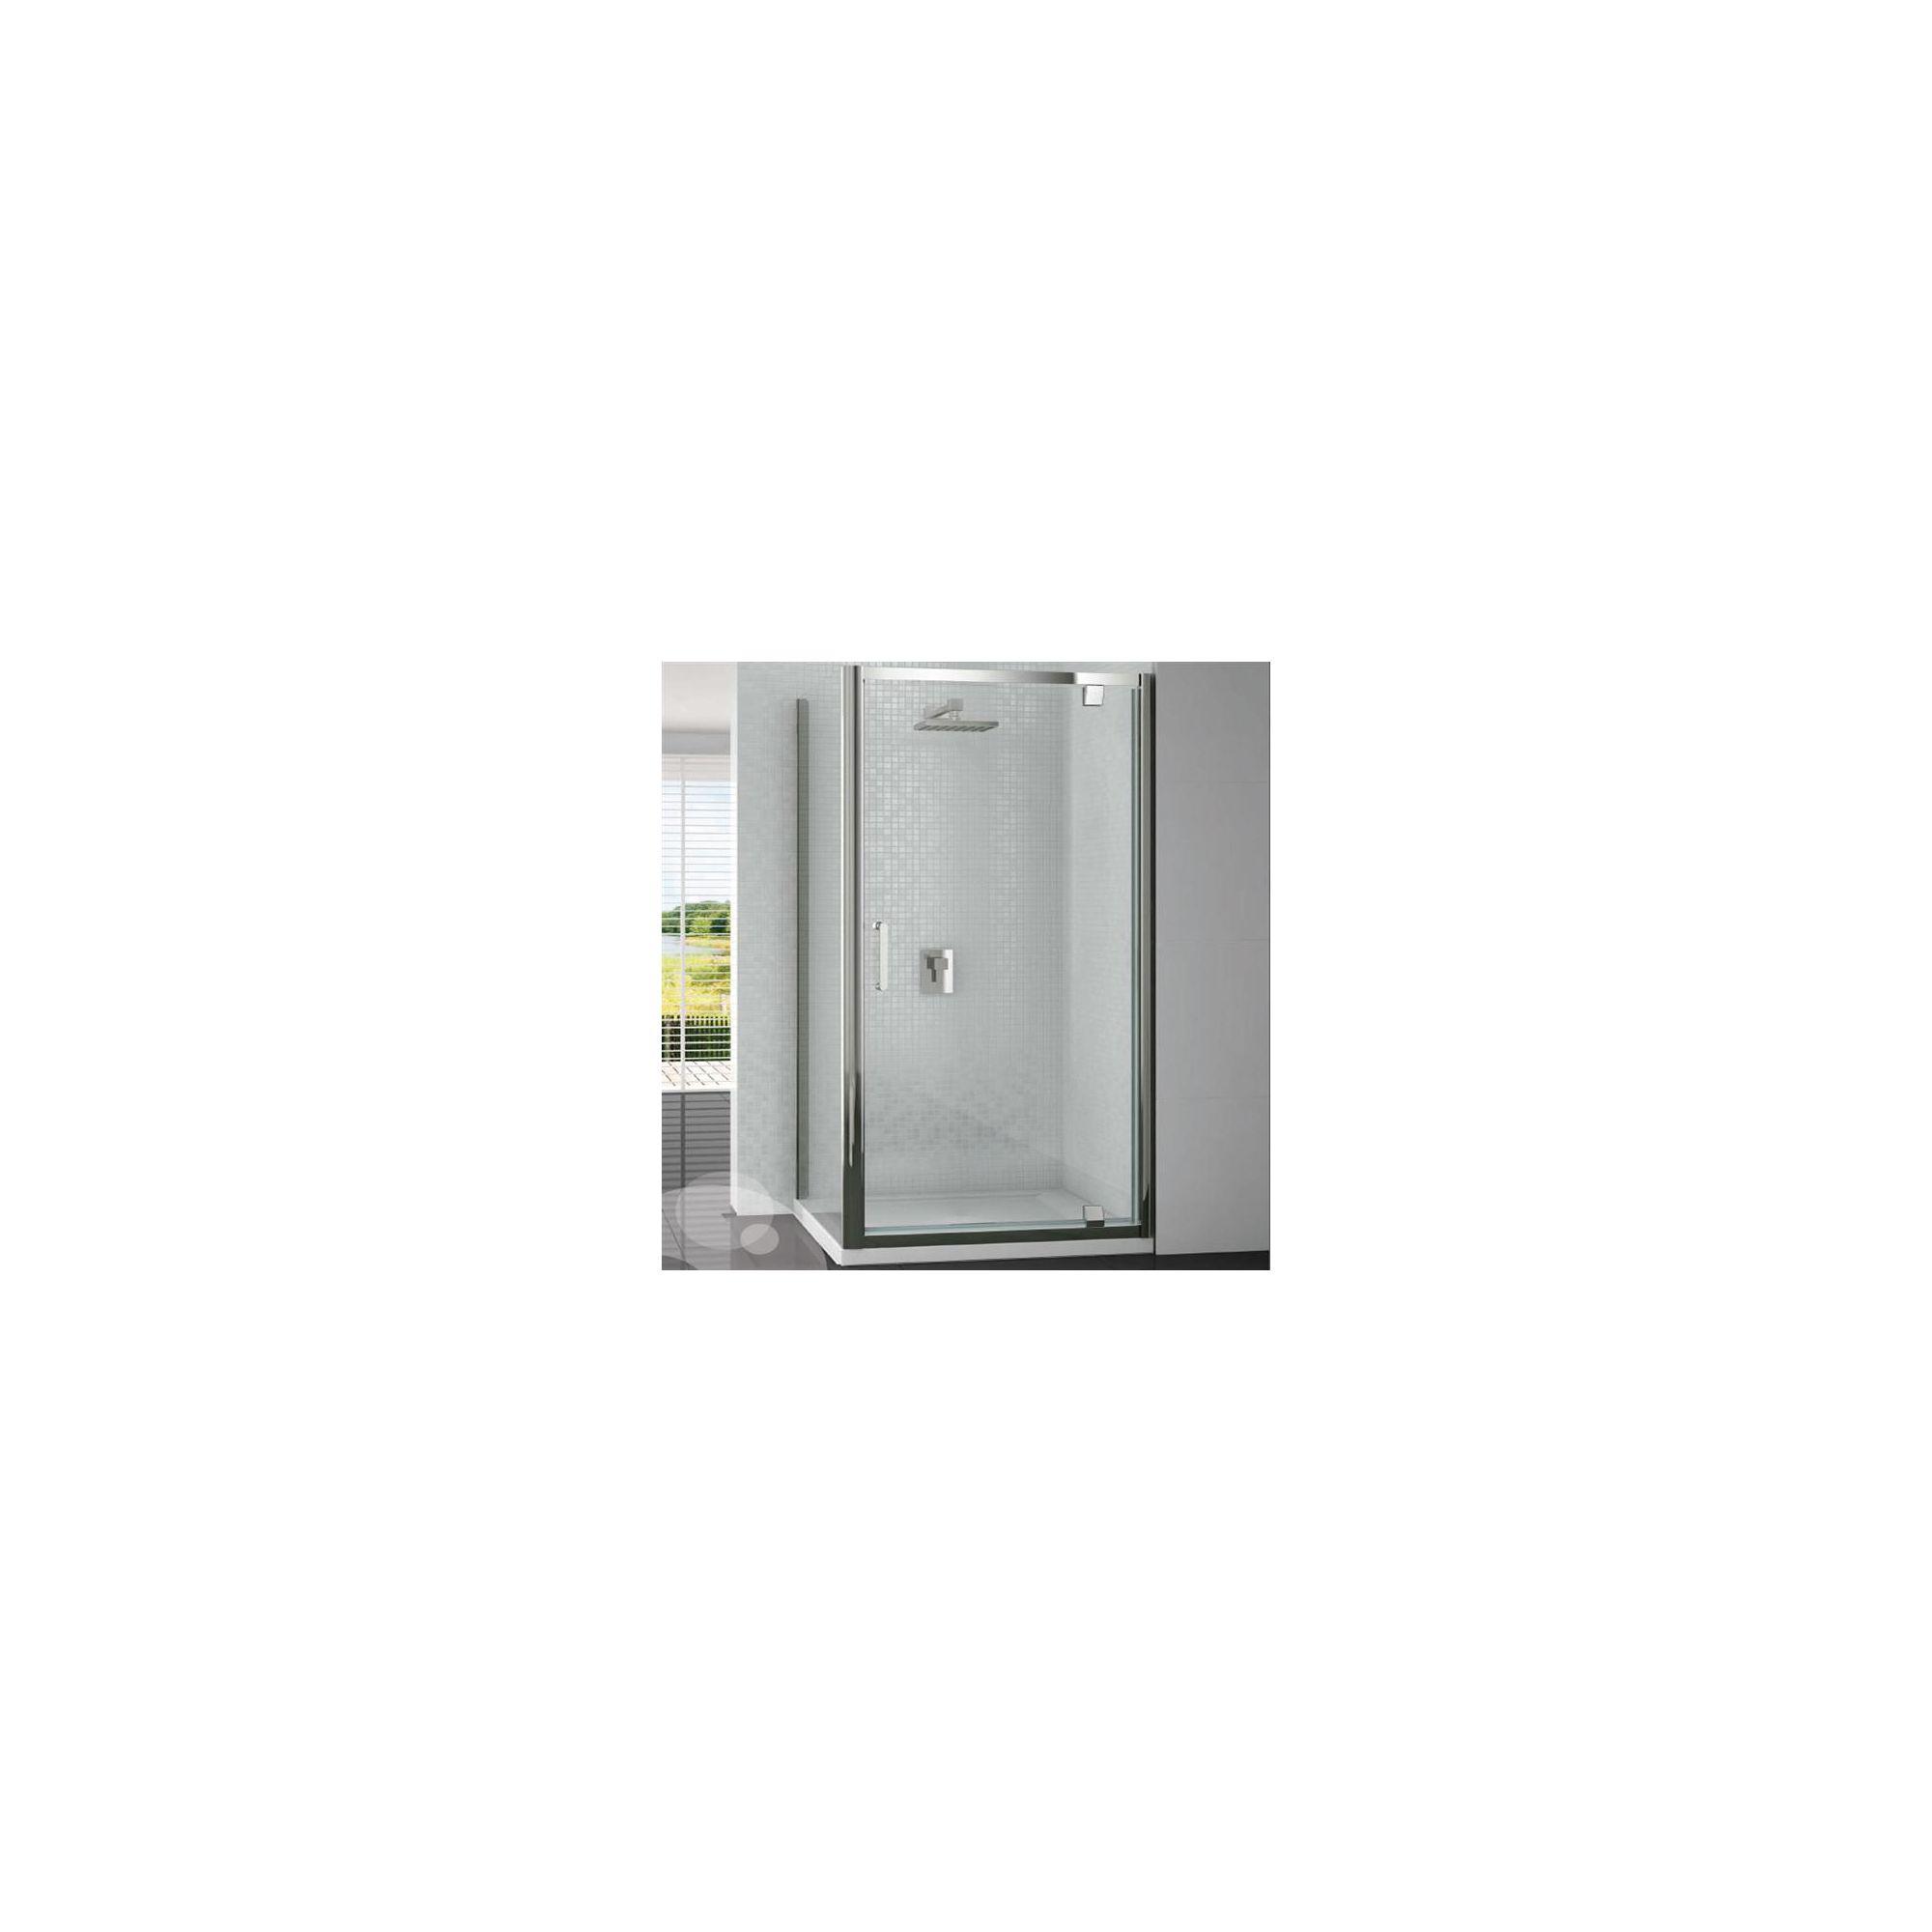 Merlyn Vivid Six Pivot Shower Door, 700mm Wide, 6mm Glass at Tesco Direct